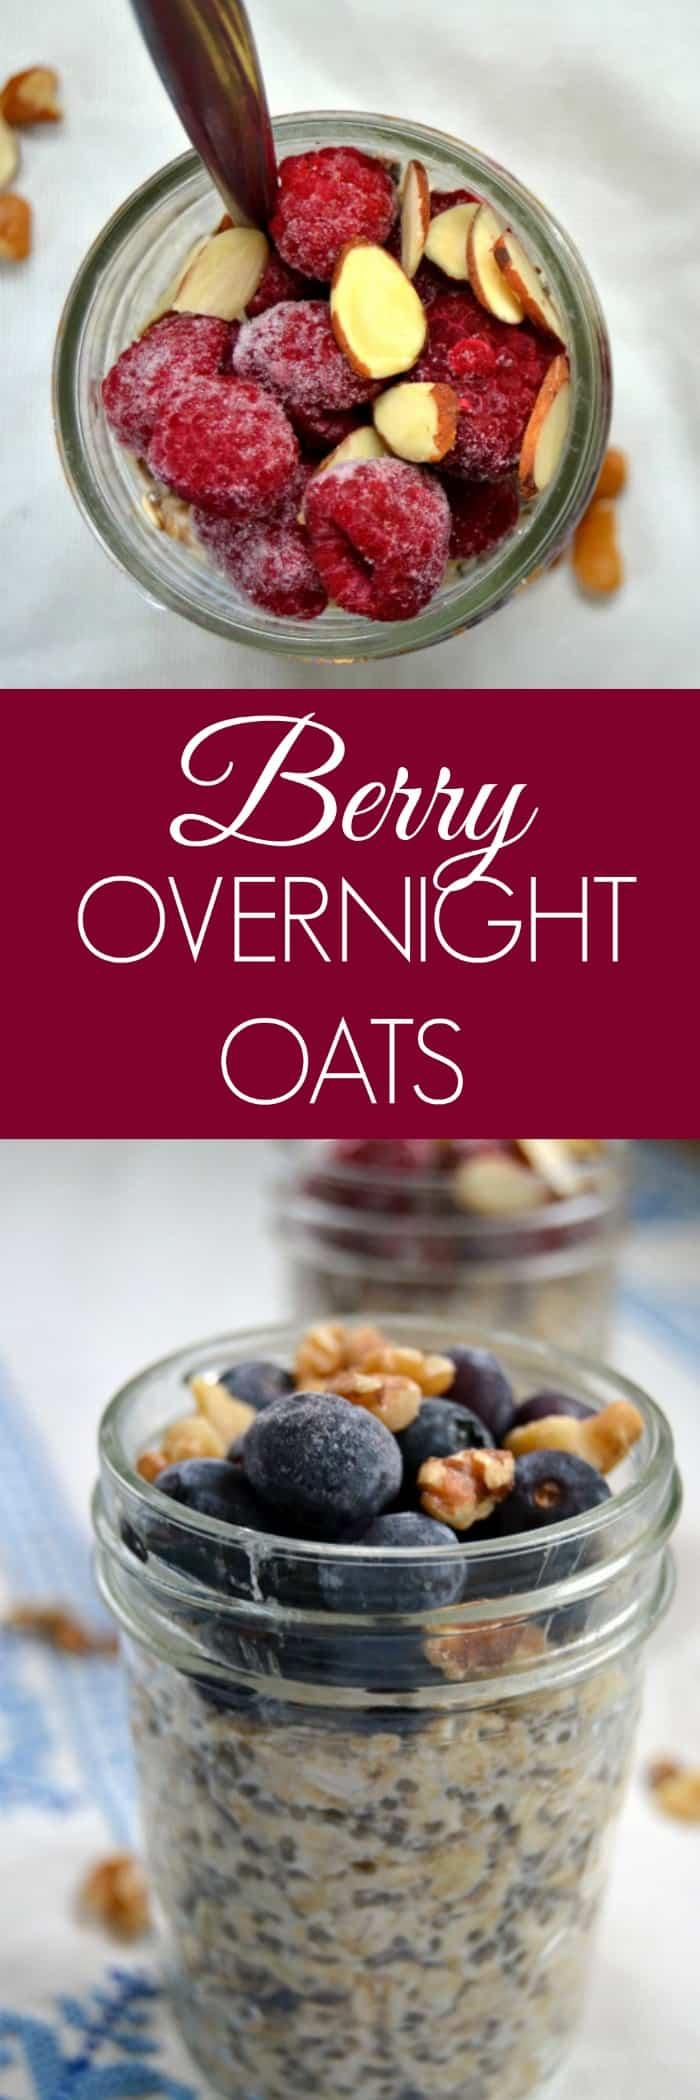 Berry Overnight Oats - Overnight Oats recipe - Overnight Oats Healthy - Overnight Oats with berries